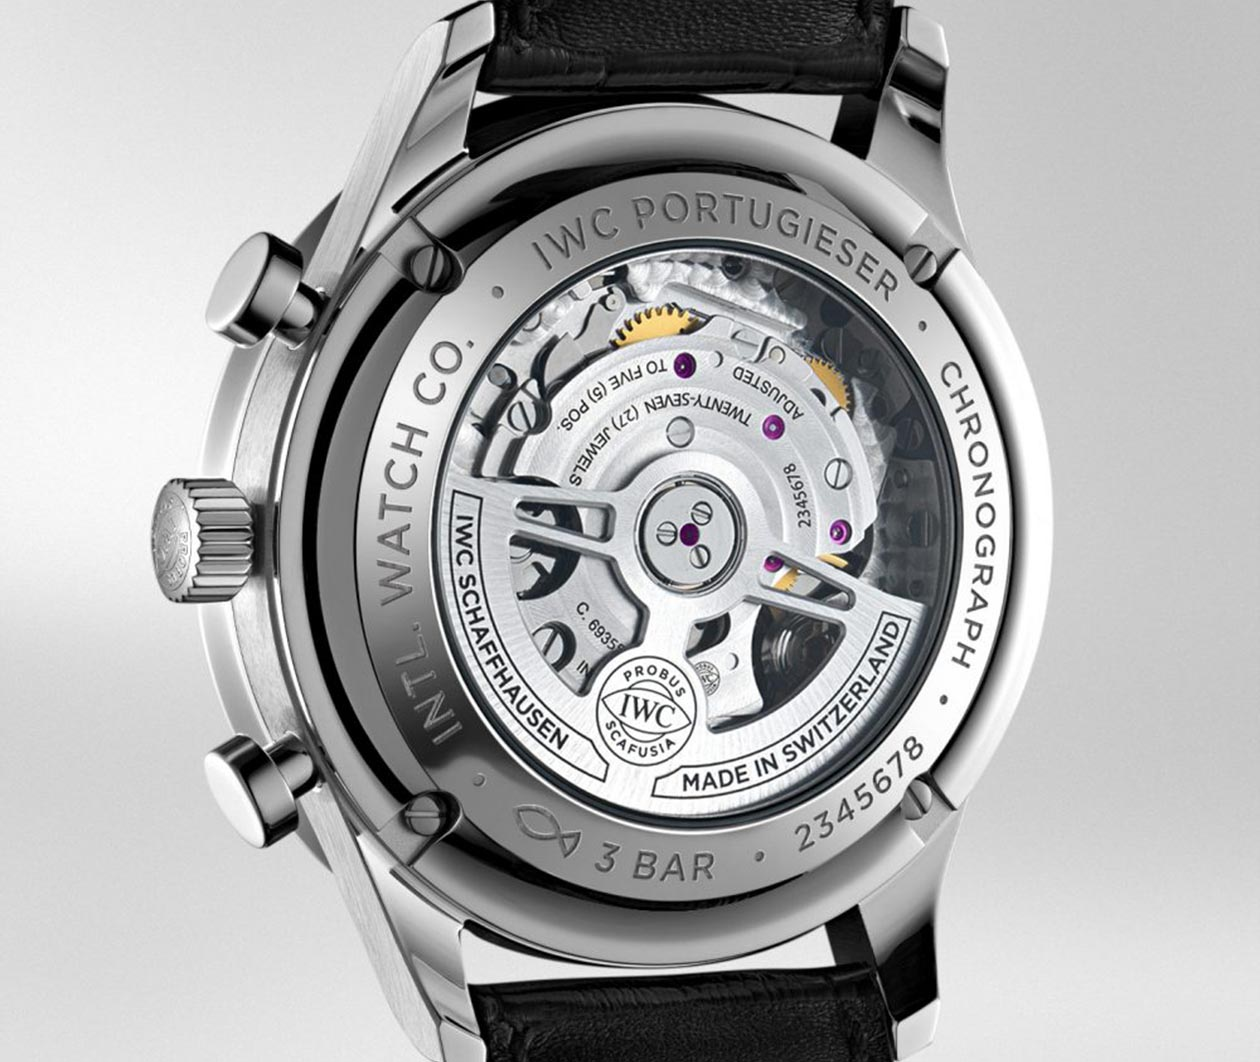 IWC Portugieser Chronograph IW371604 Carousel 4 FINAL